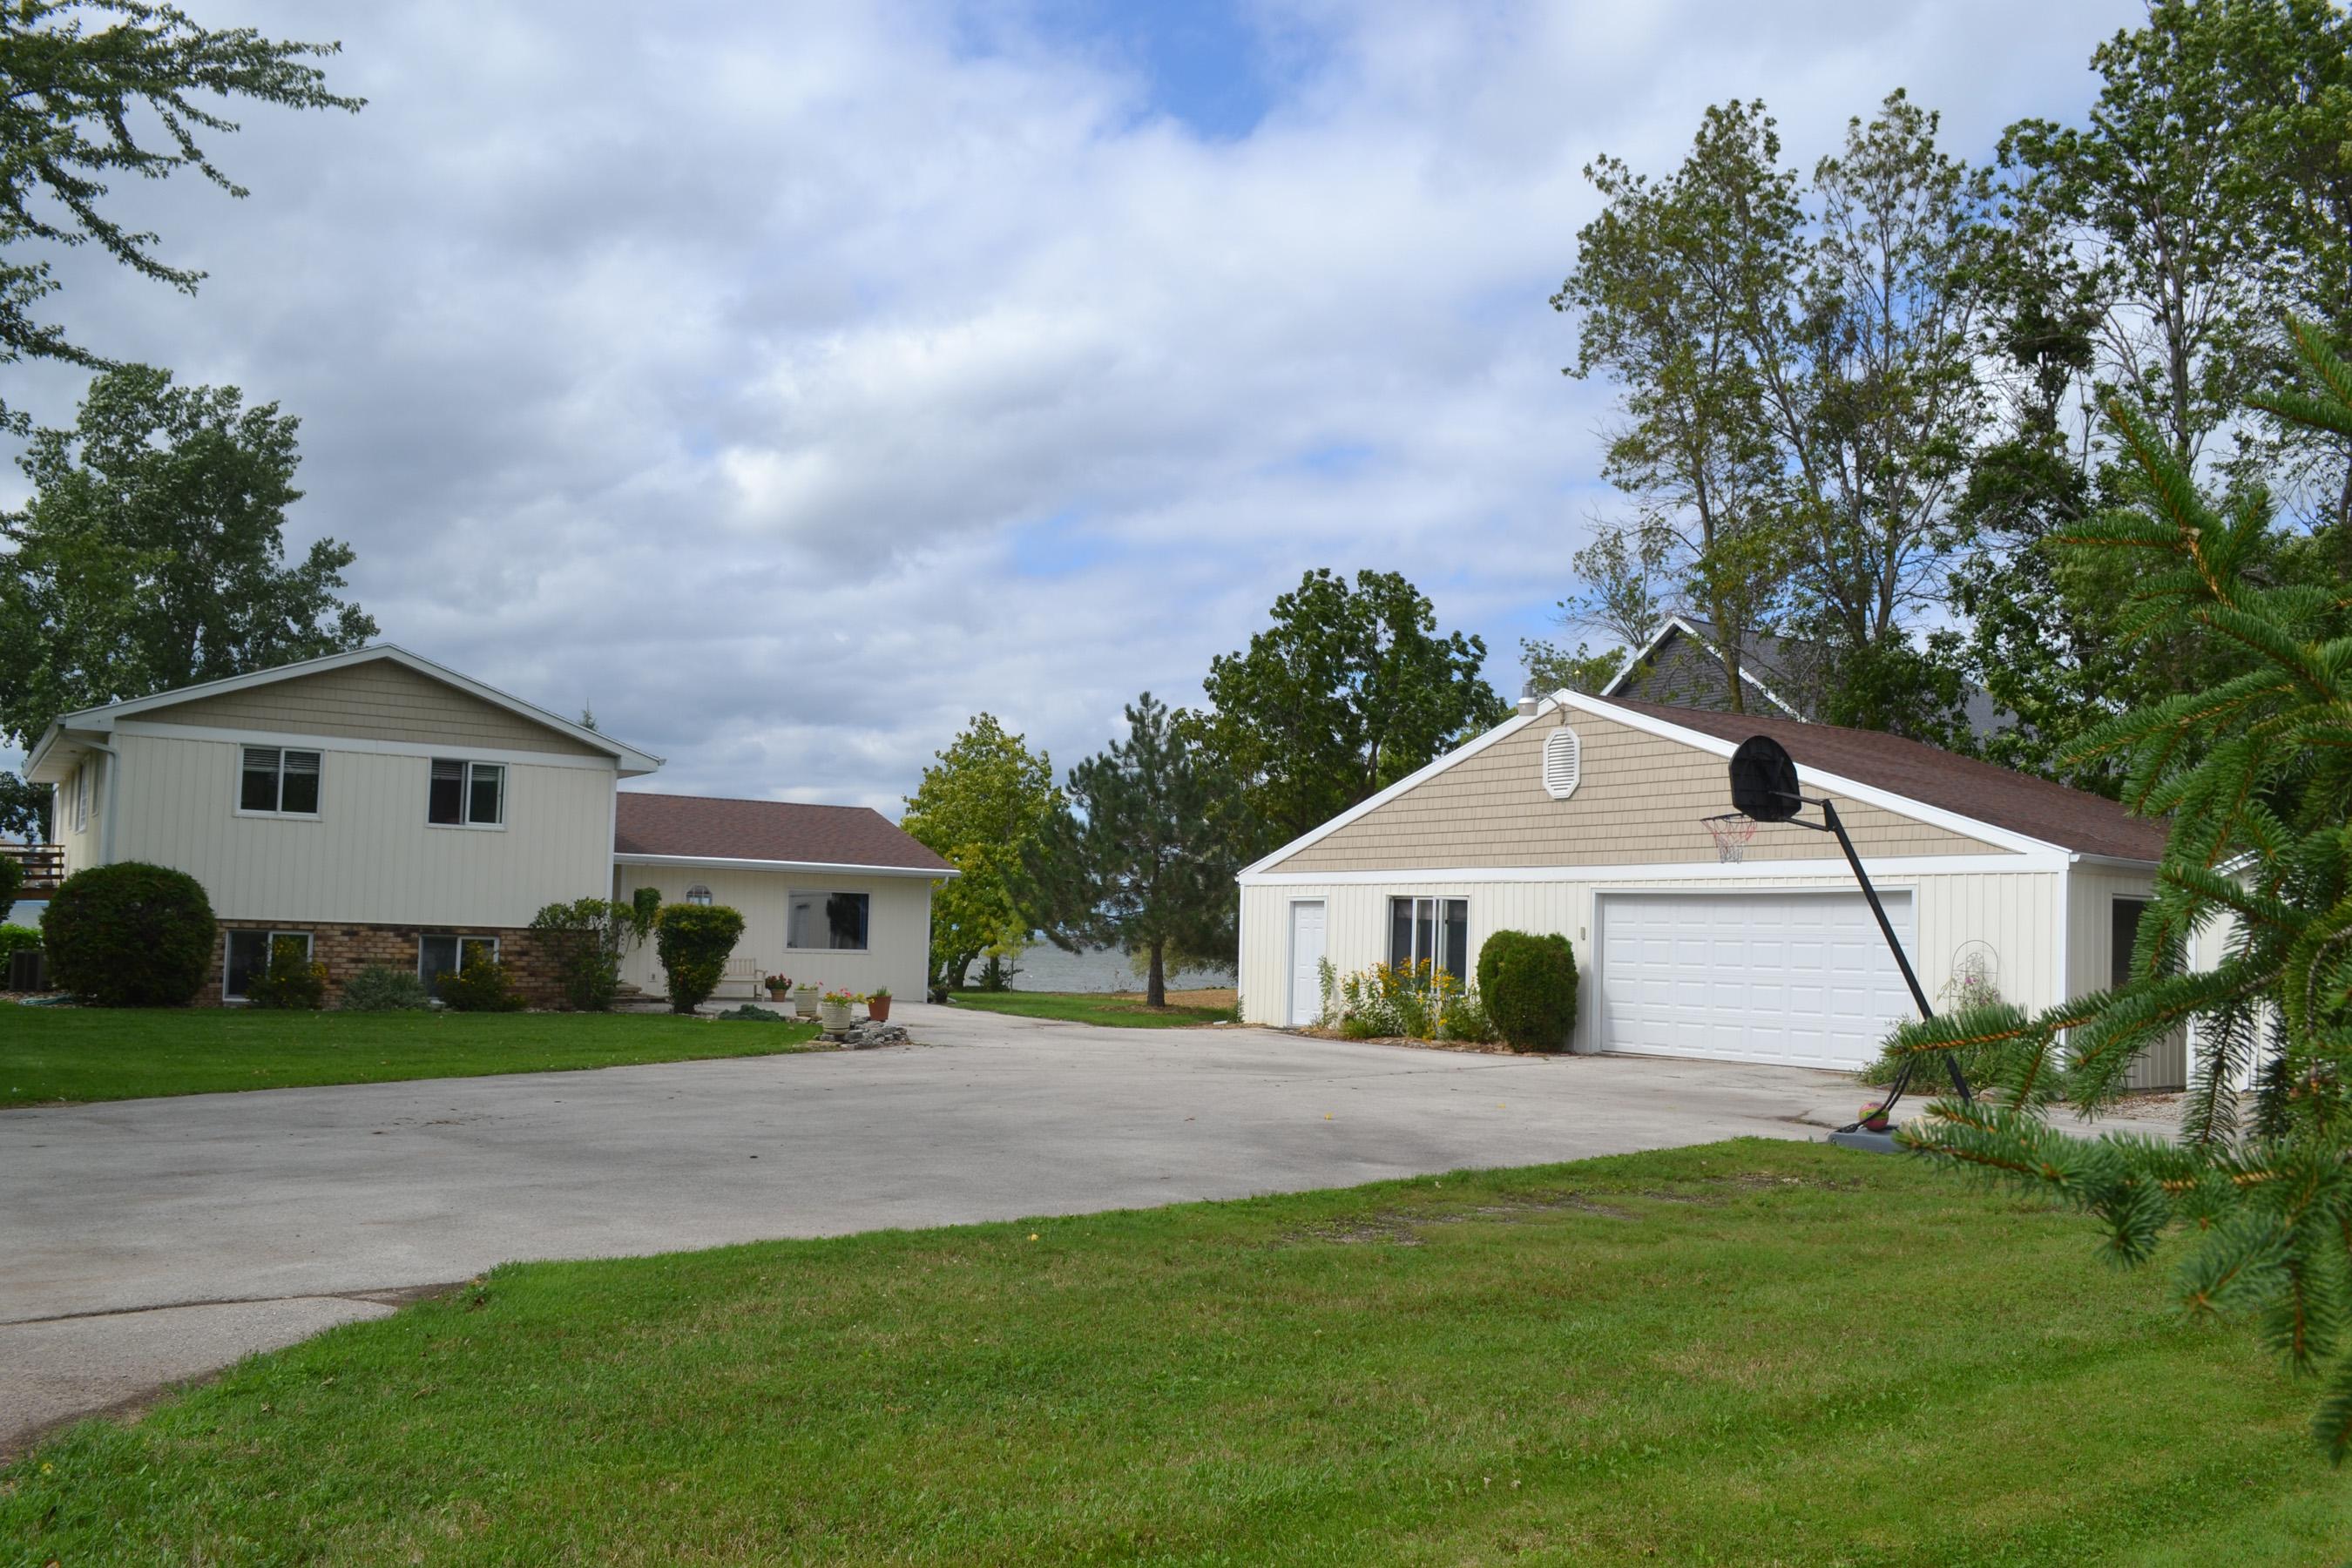 N8915 County DK, Luxemburg, Wisconsin 54217